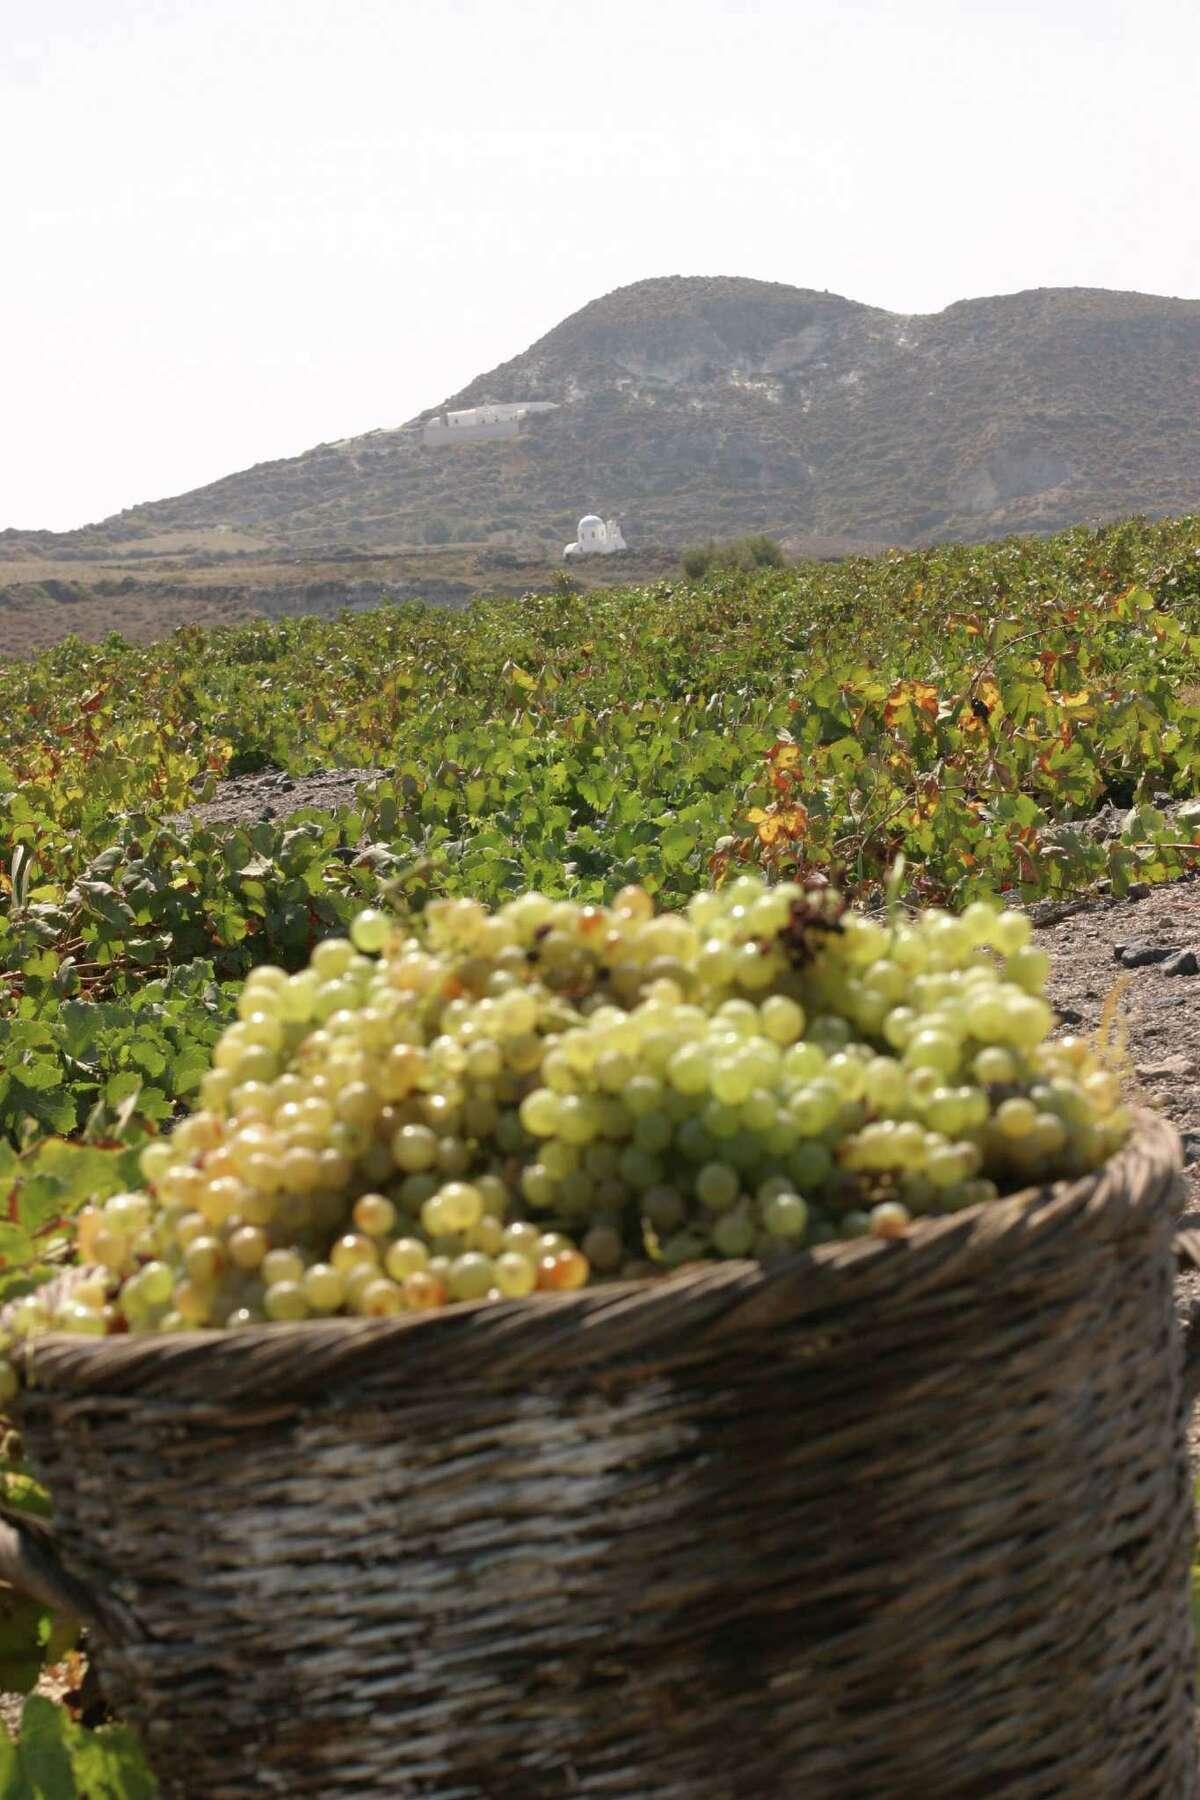 Santorini Vineyard grapes. Boutari Vineyards vines on the Greek island of Santorini are grown in a nest.